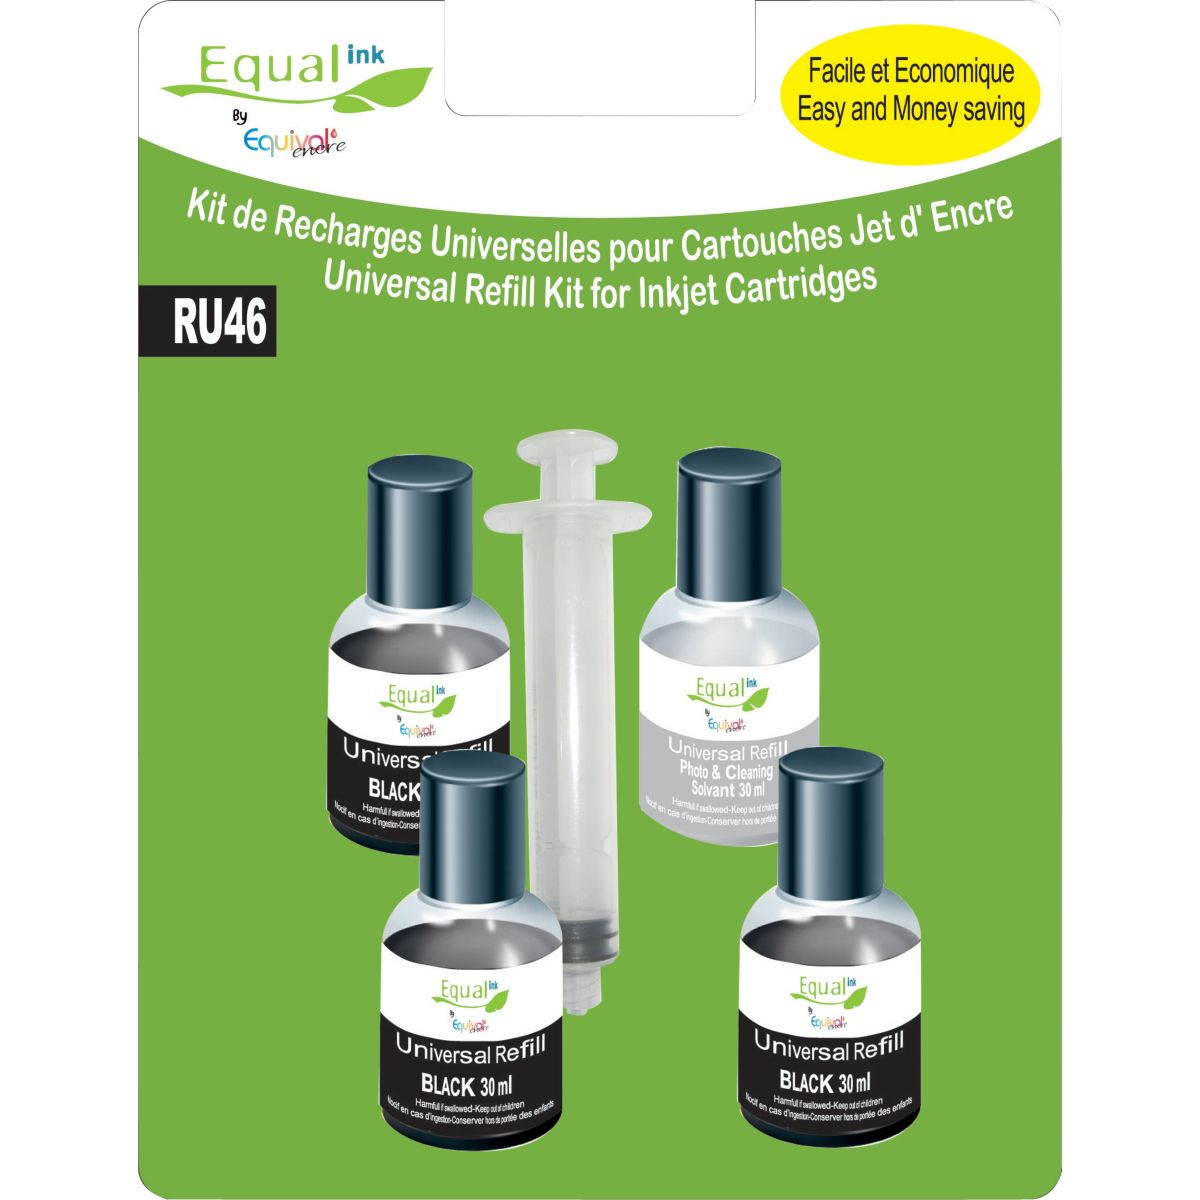 Recharge universelle EQUAL'INK 4 Recharges universelles noire+solvant